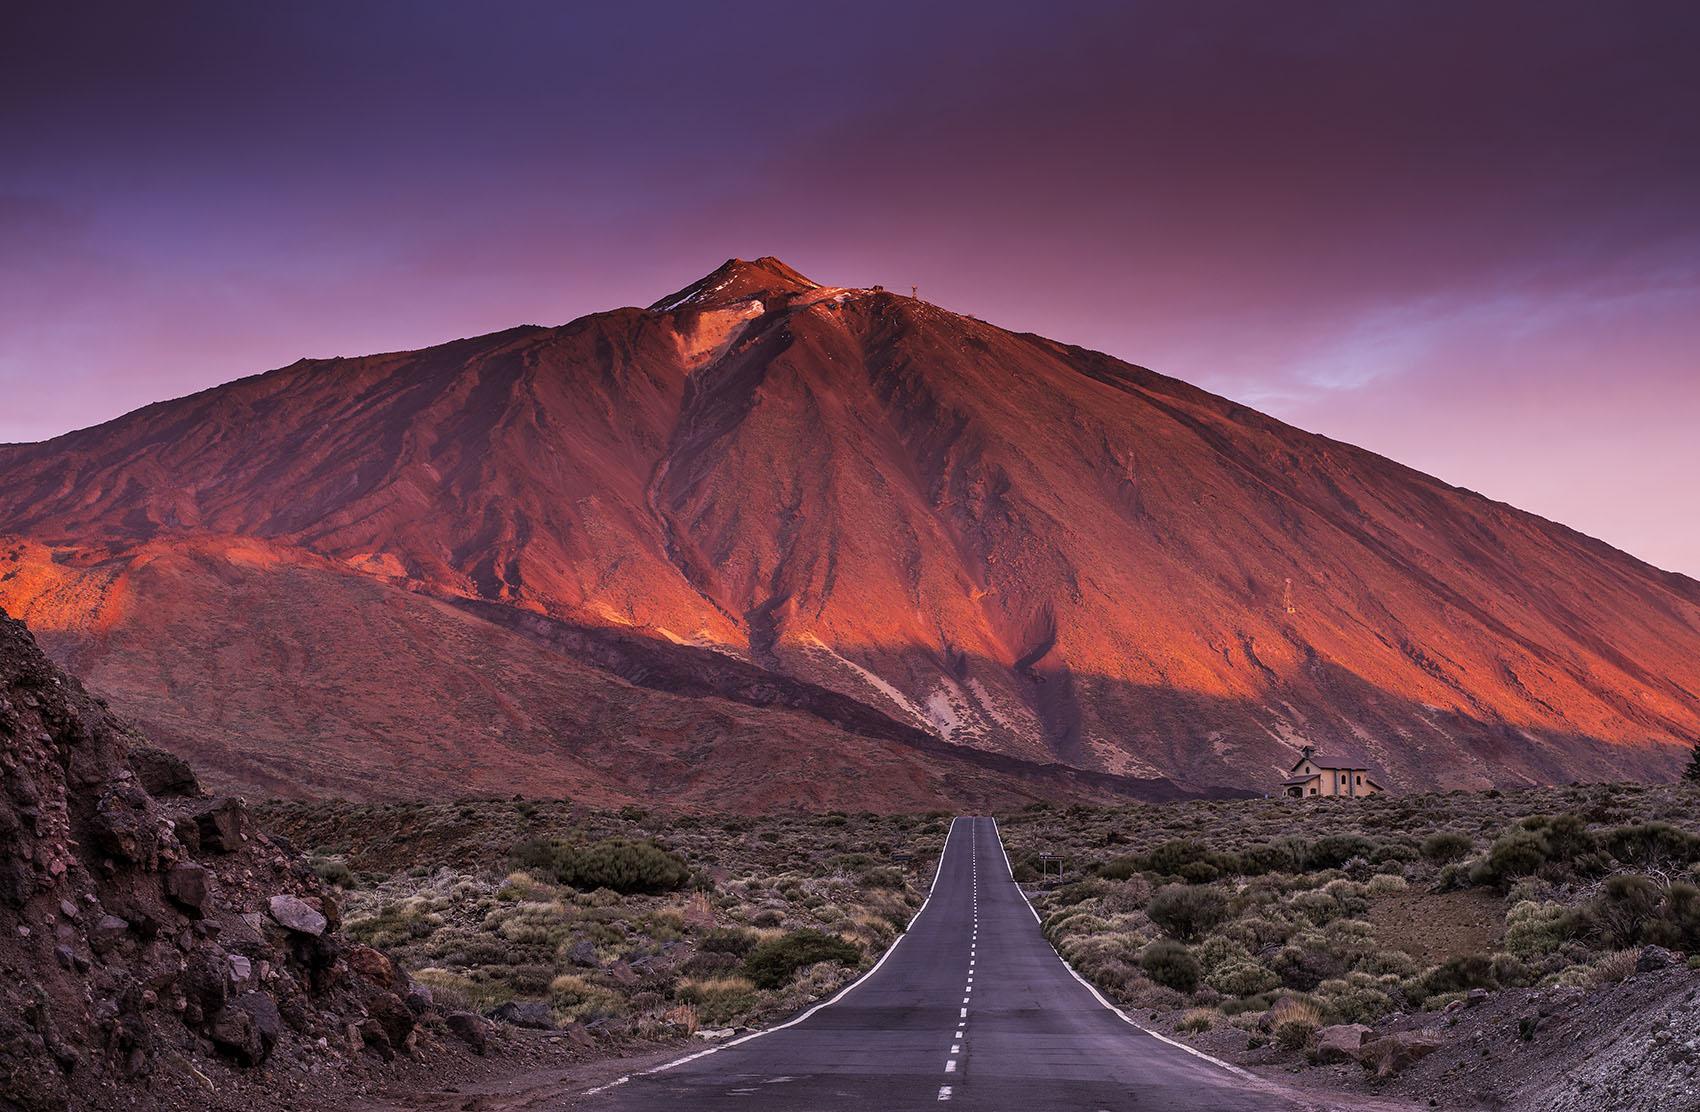 Dawn over Teide, Tenerife